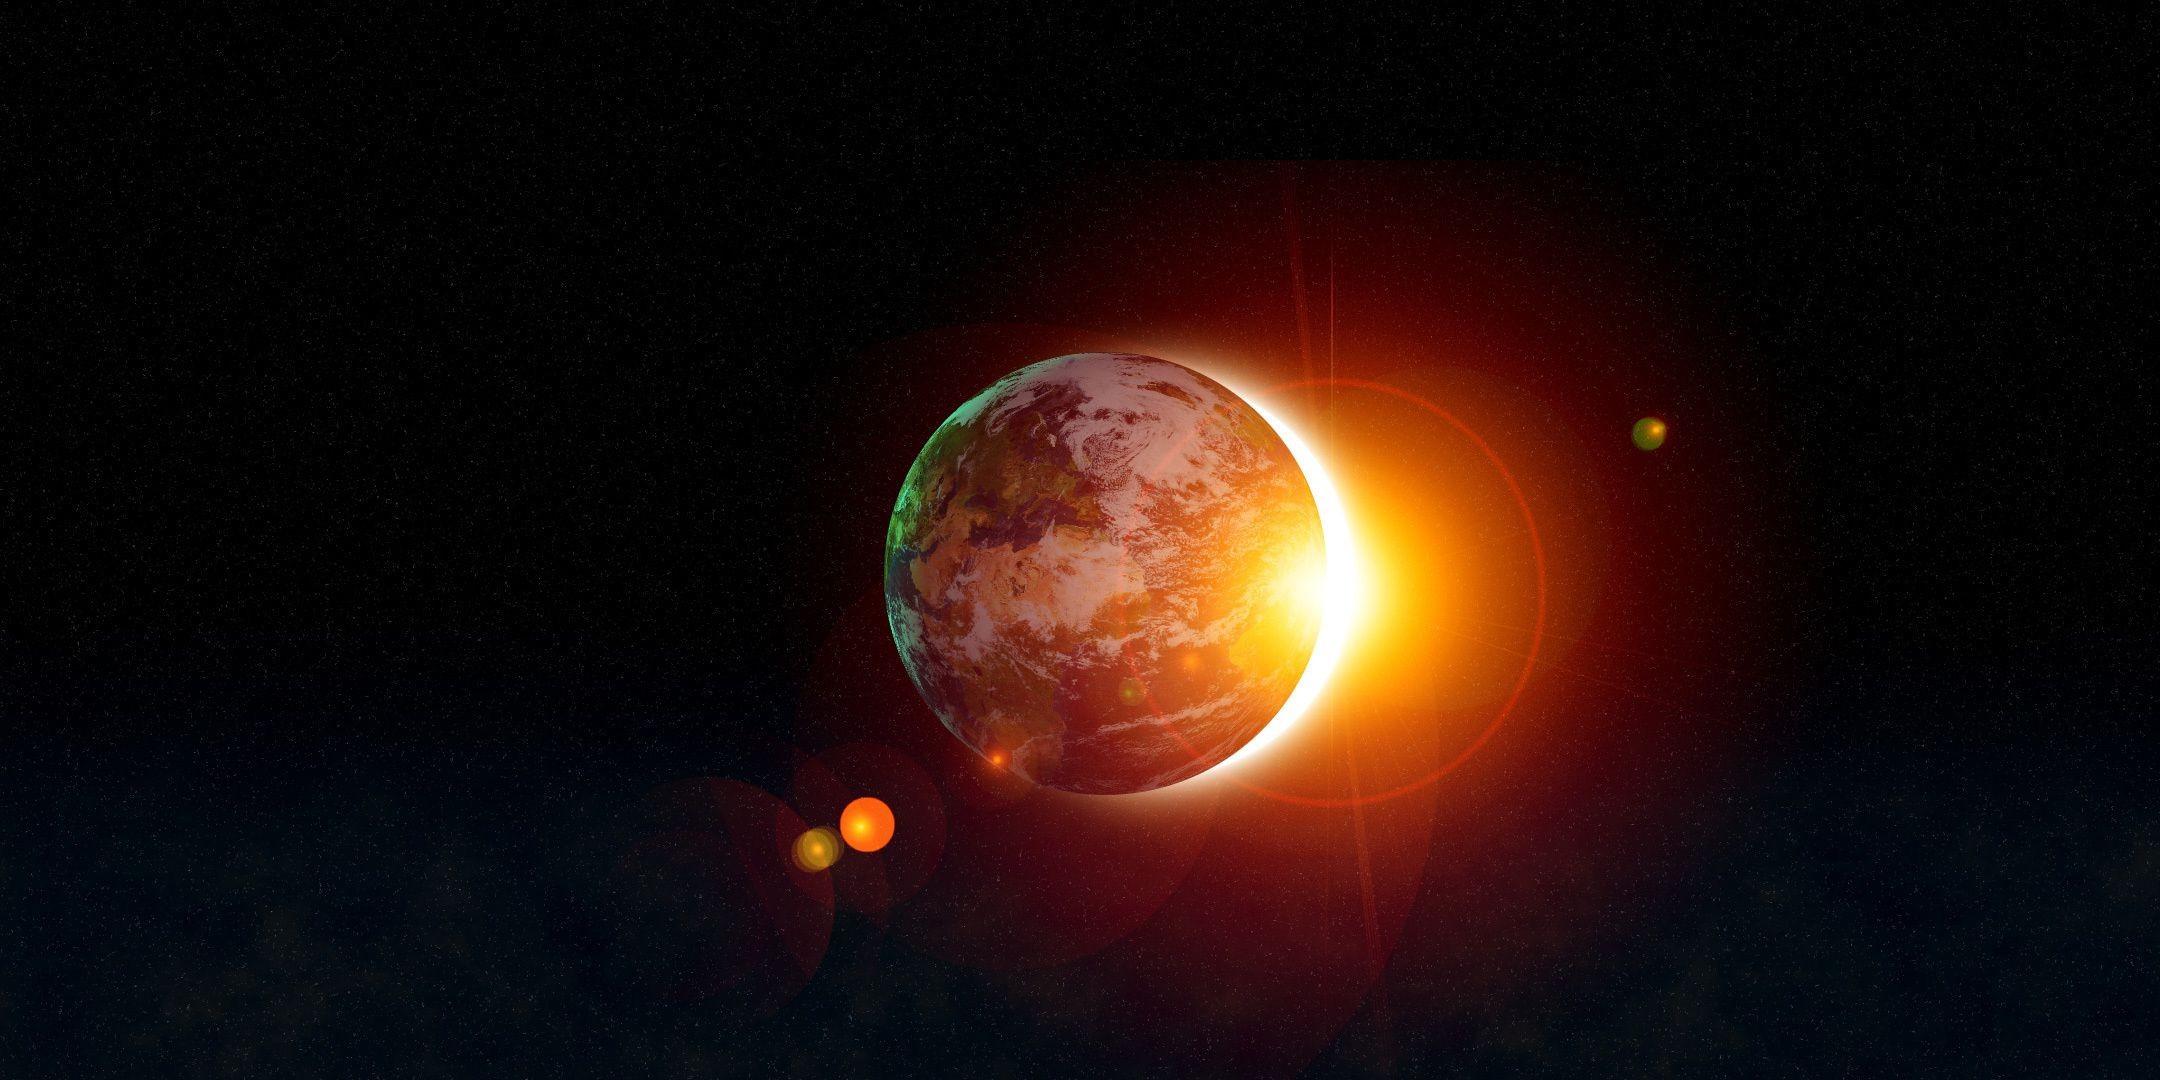 planets surrounding the sun - HD2160×1080